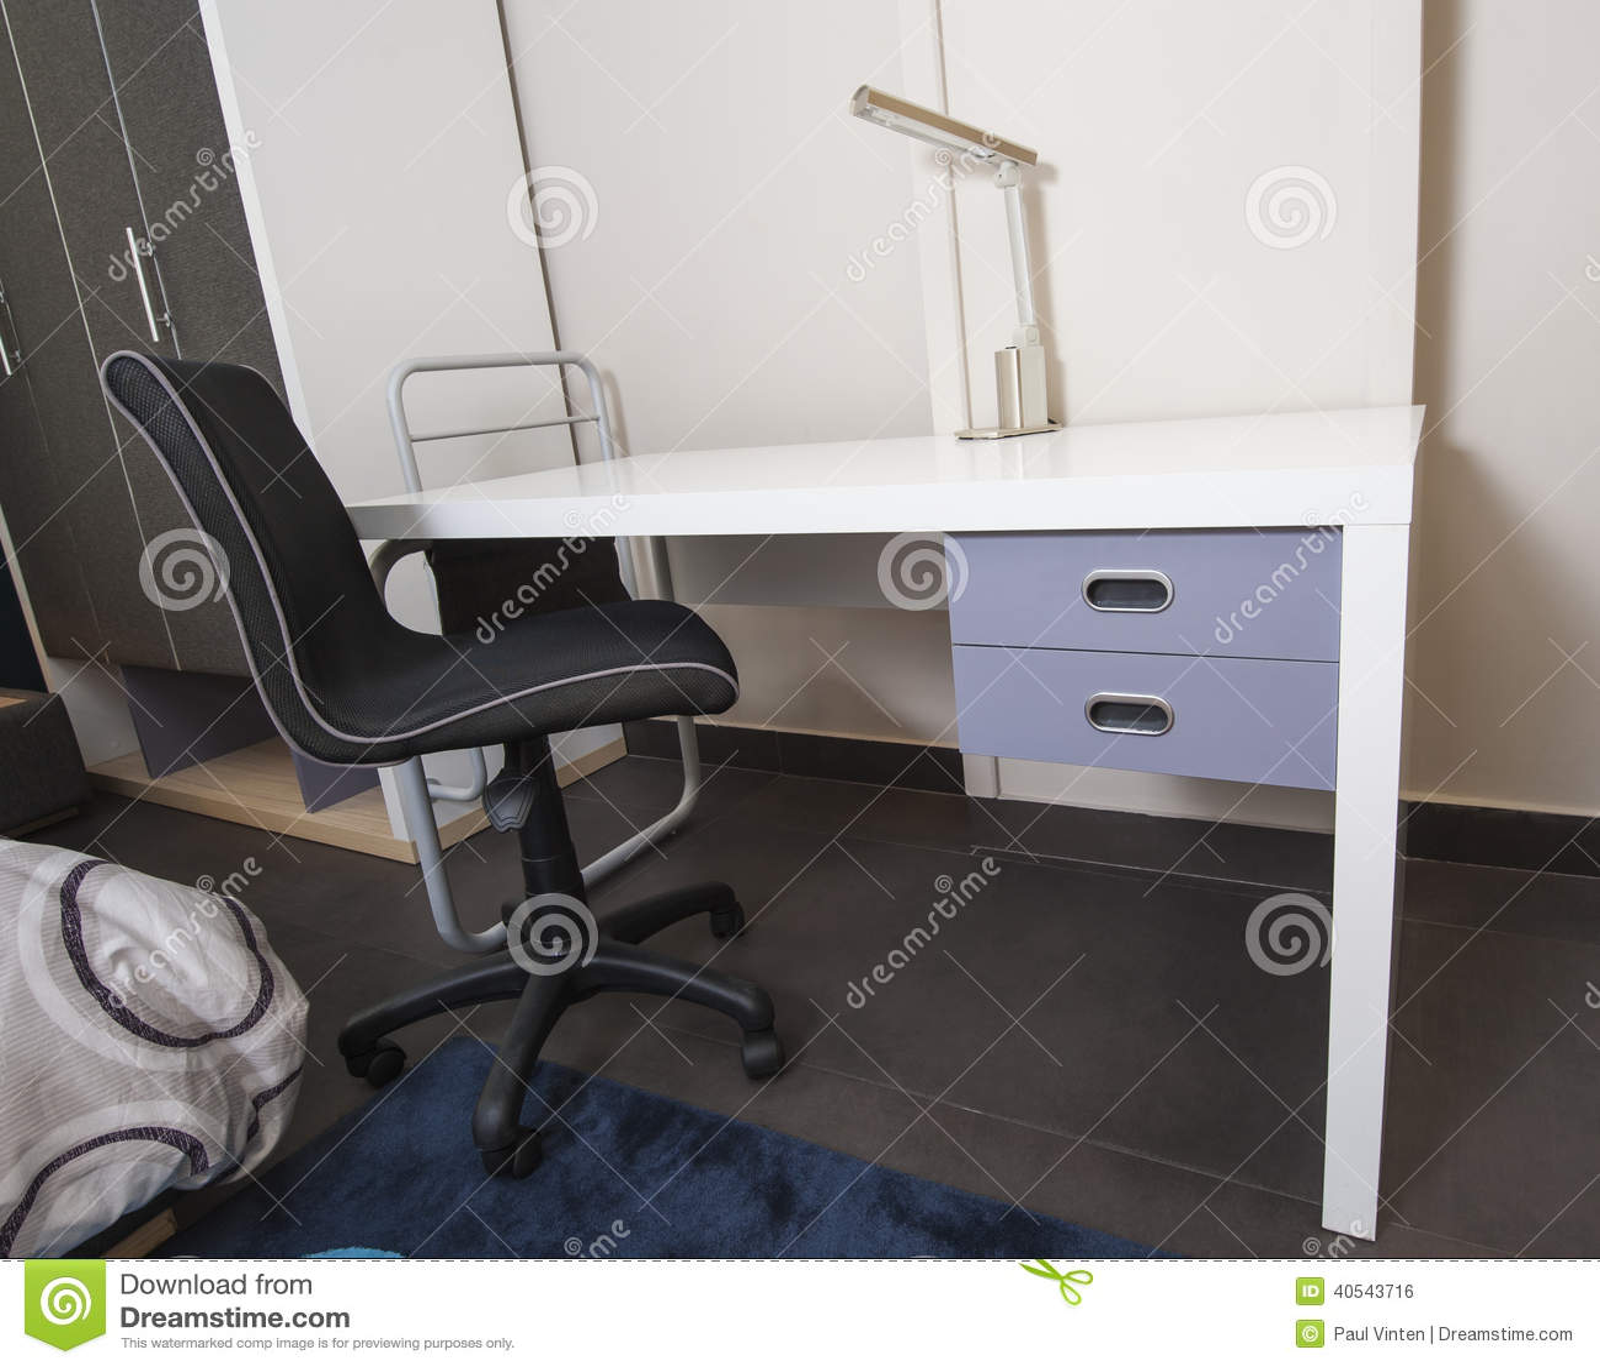 Desk In Childrens Bedroom Area Stock Photo Image 40543716